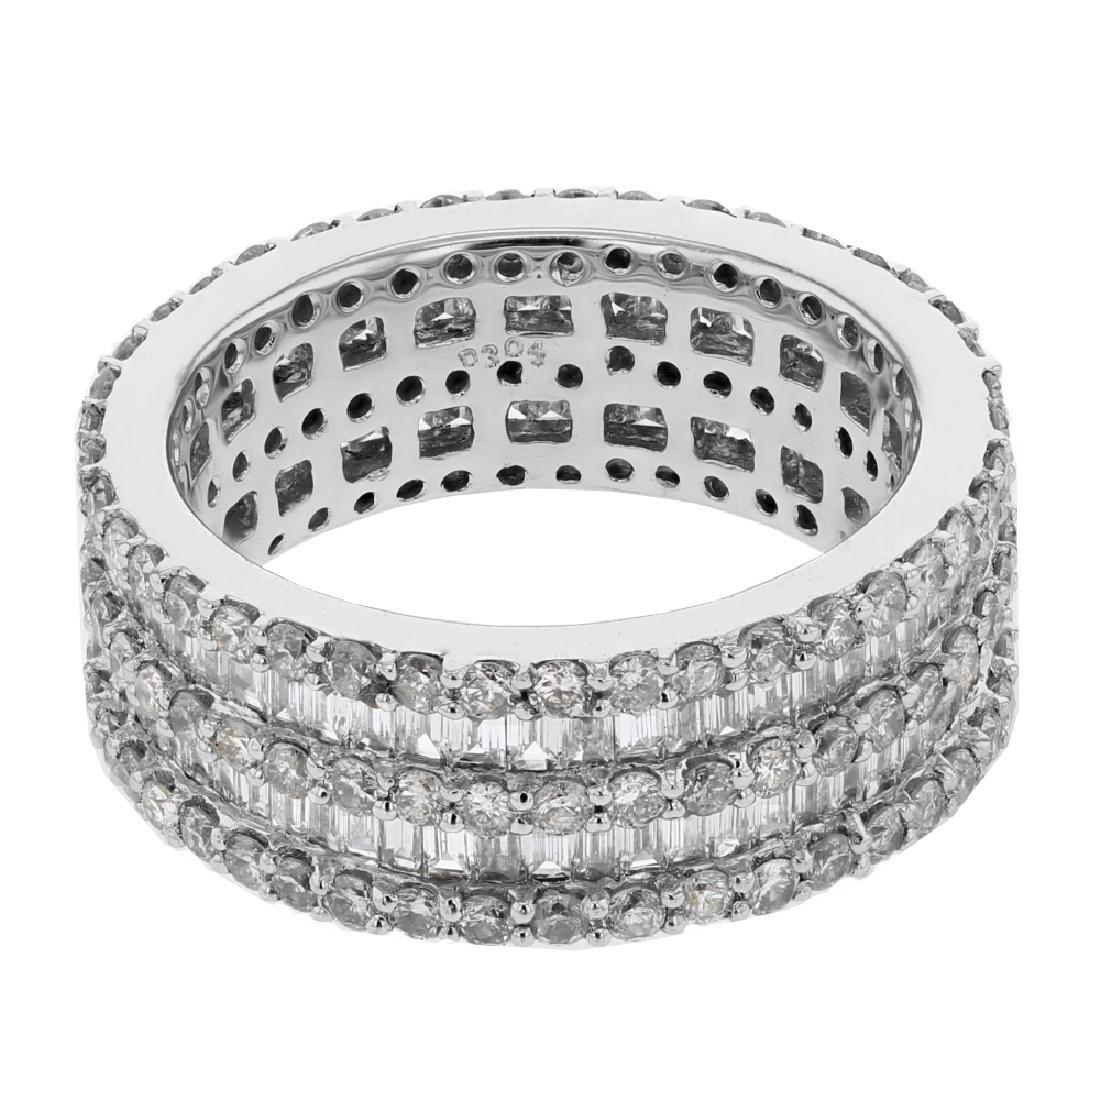 1.99 CTW Baguette & White Round Diamond Ring 18K White